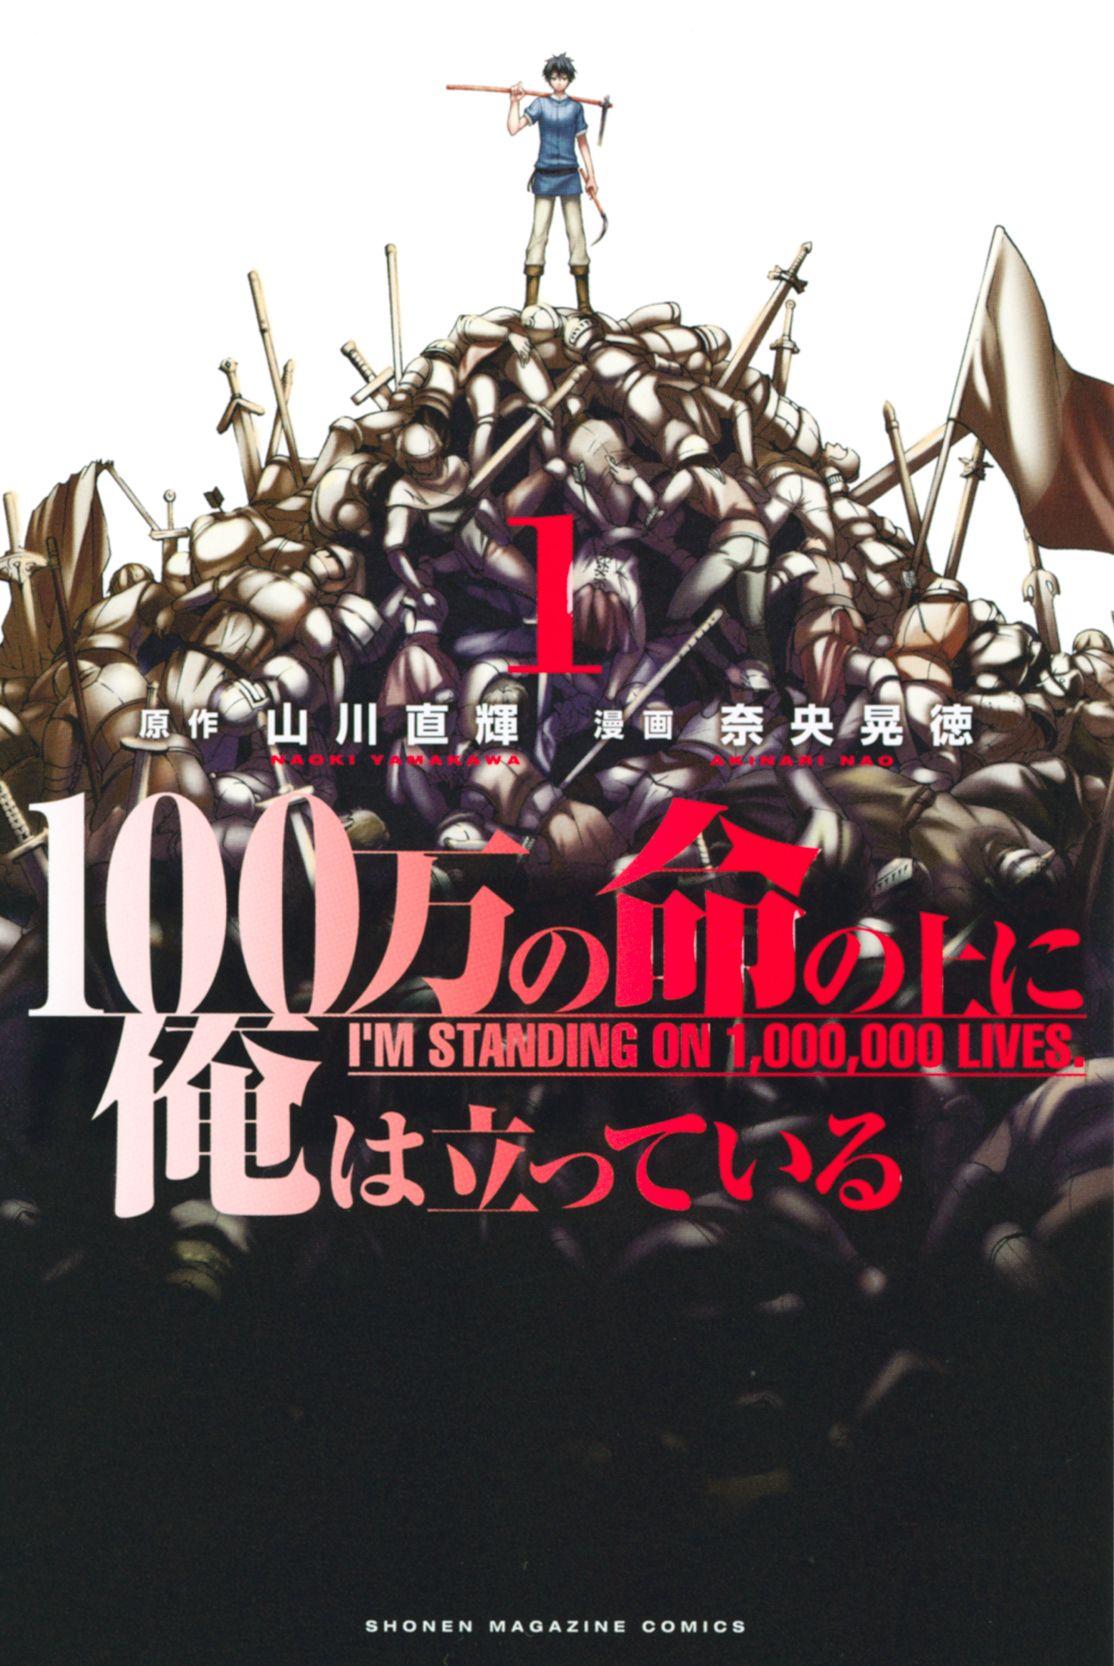 https://c5.ninemanga.com/es_manga/pic2/44/20396/518792/c93149a5883c97447cd38f4f46ce72ec.jpg Page 2